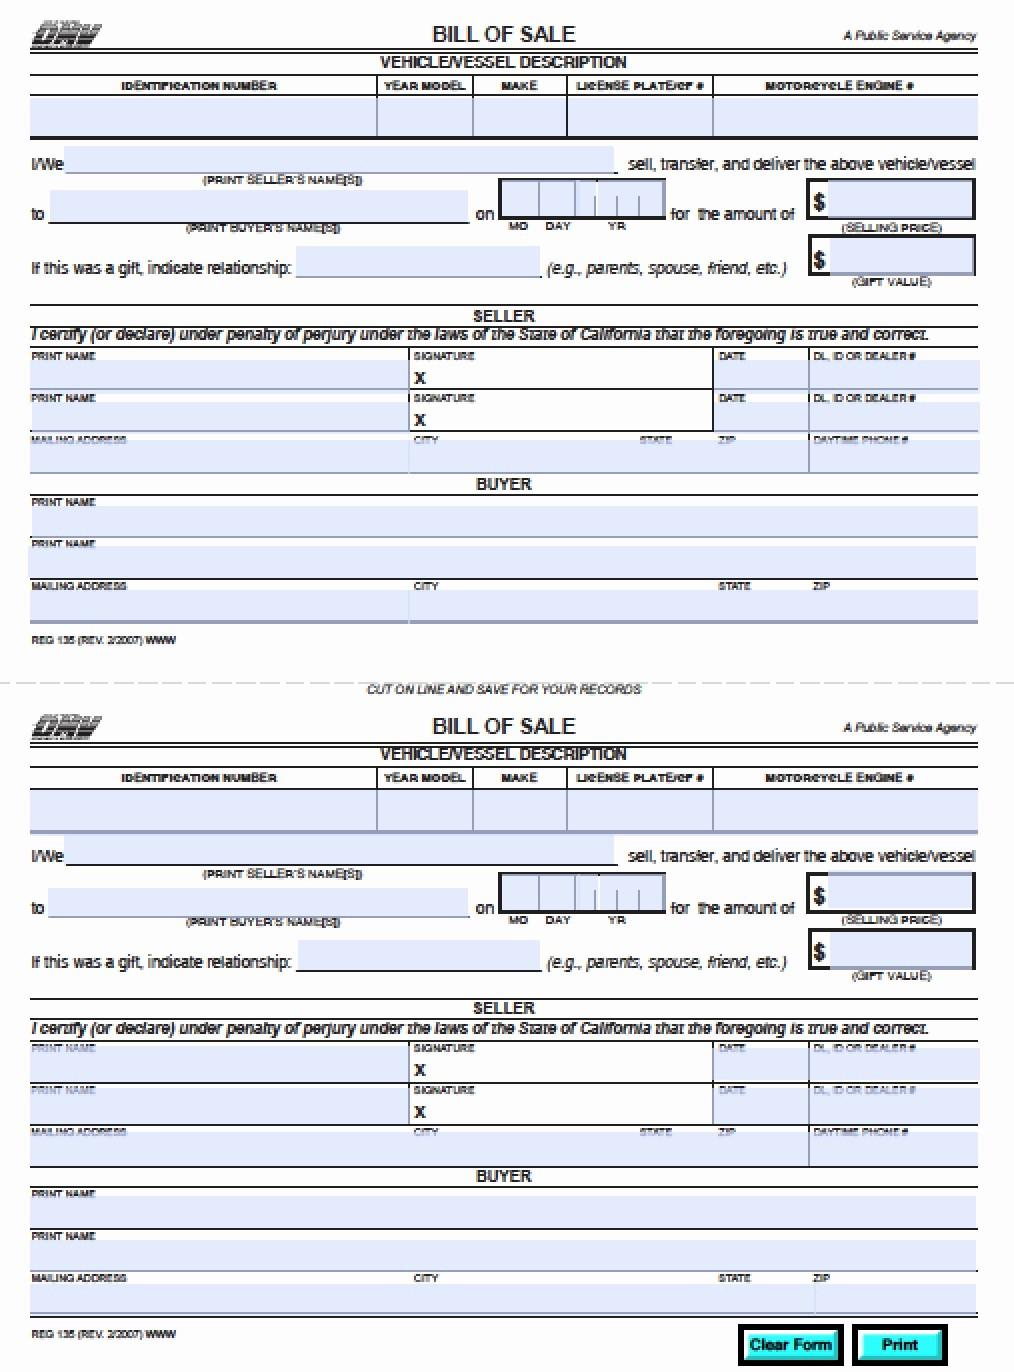 Florida Automobile Bill Of Sale Beautiful Free California Dmv Bill Of Sale Reg 135